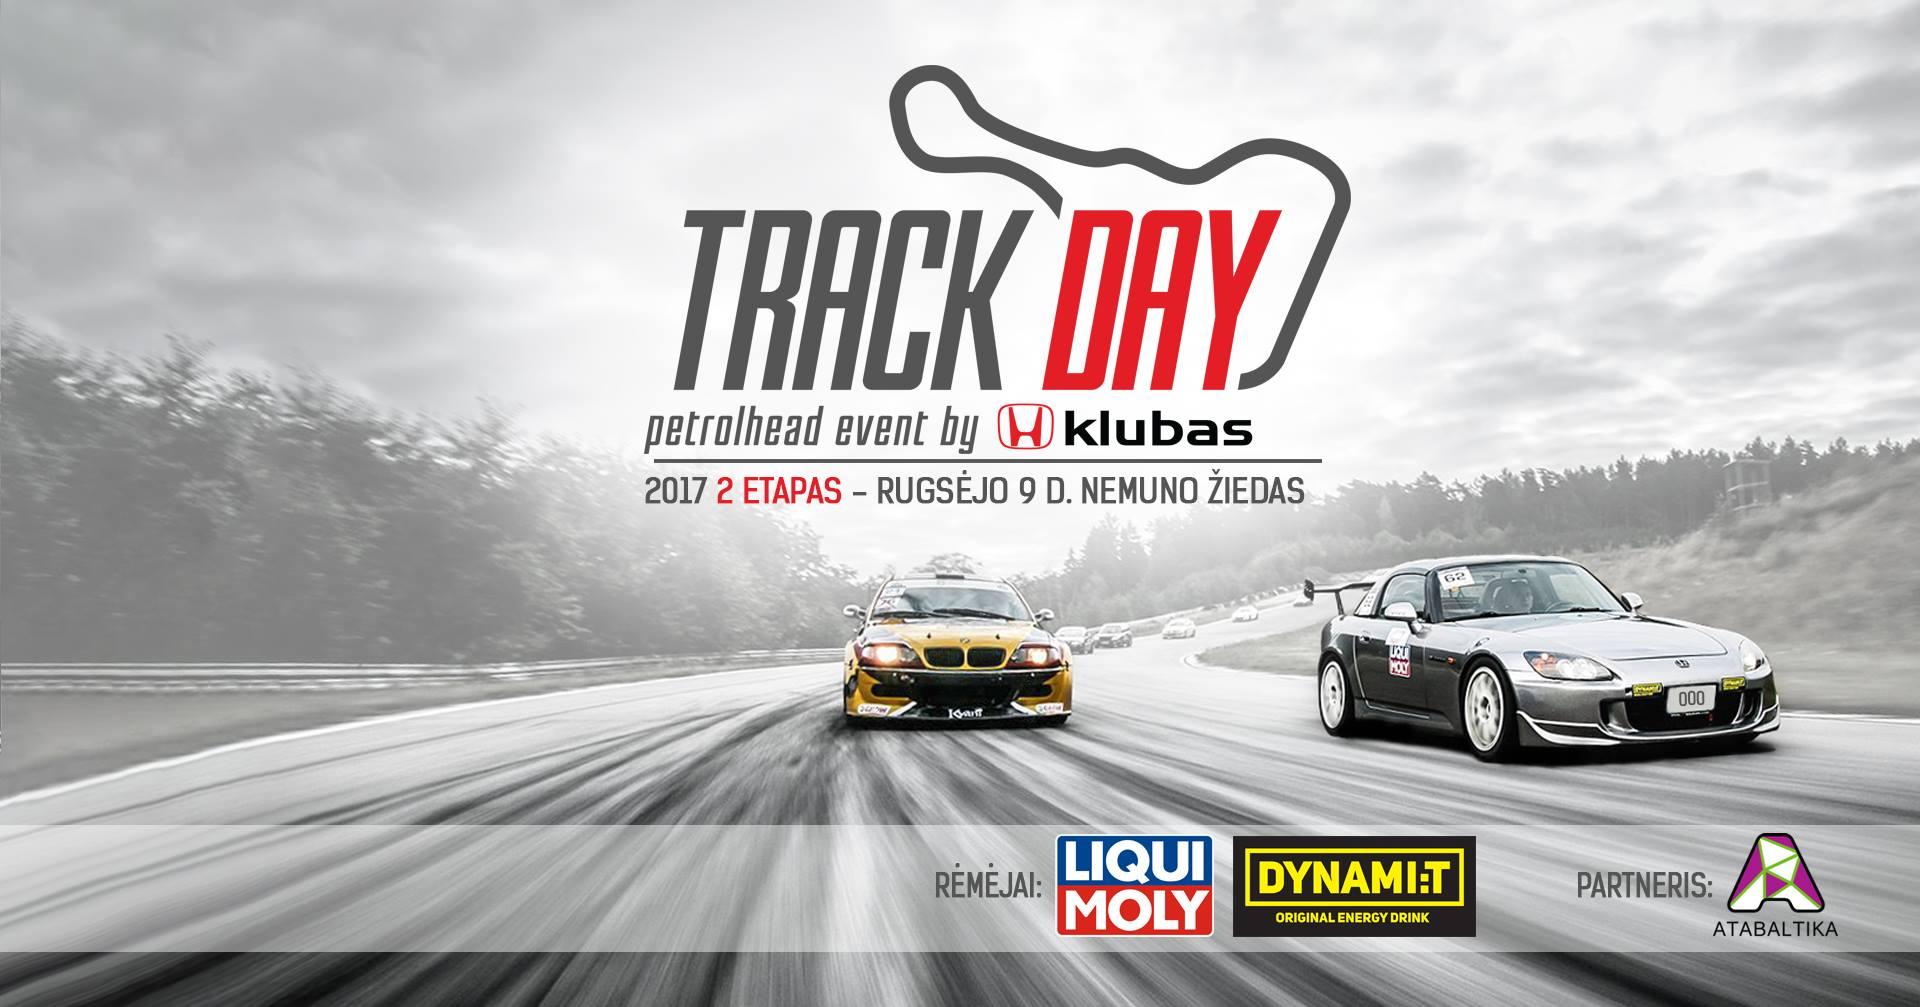 Trackday. Petrolhead event by Honda klubas